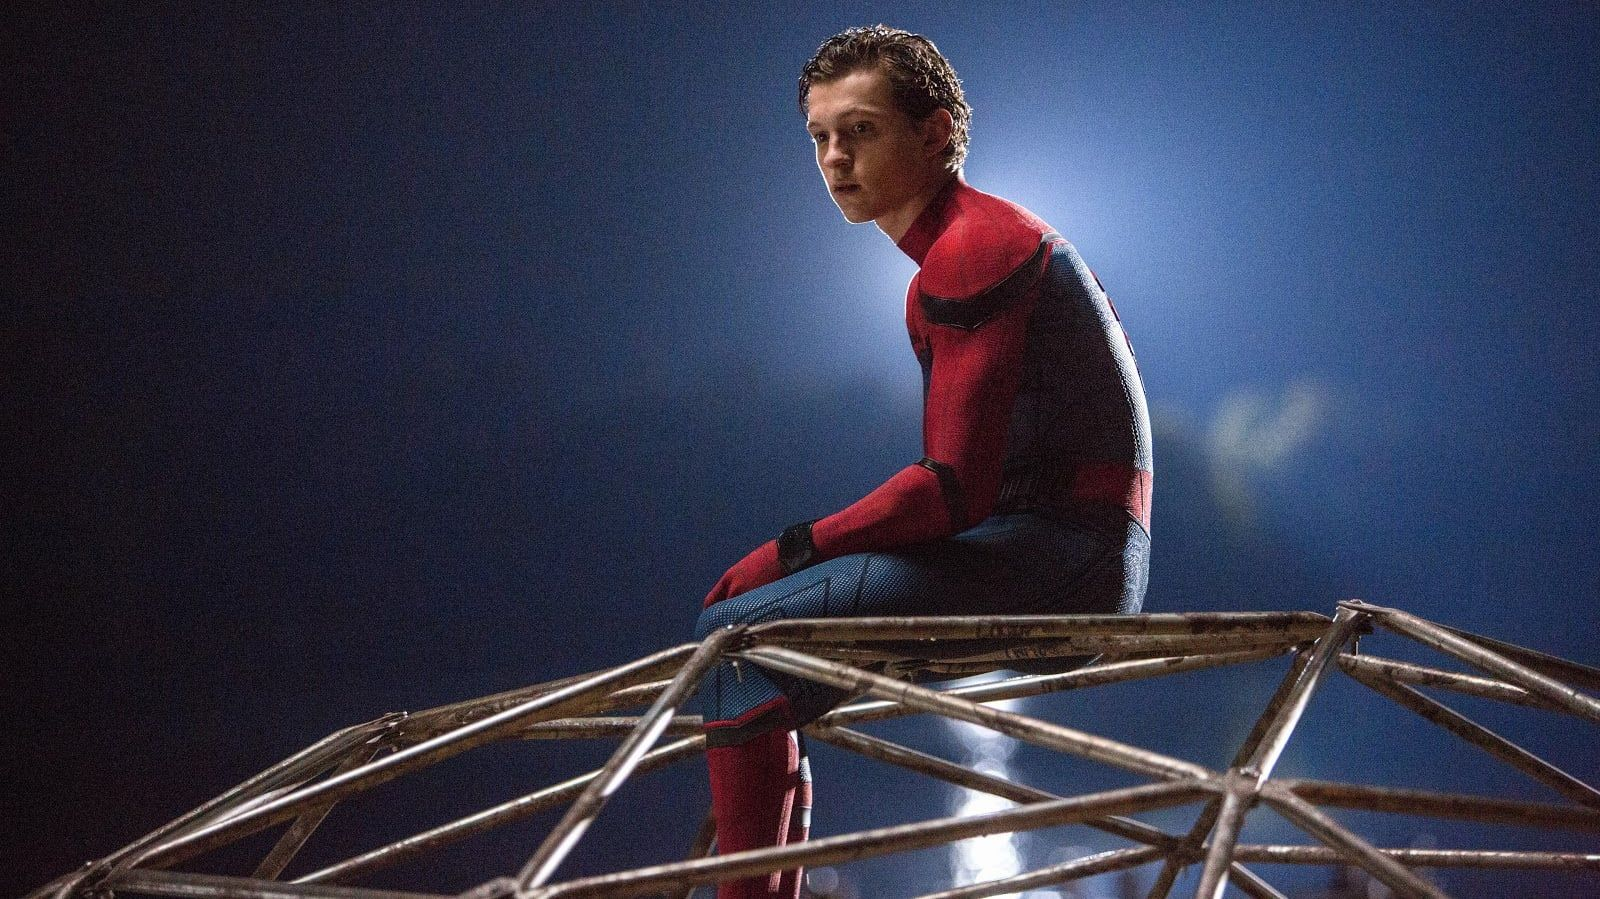 Spider Man Homecoming 2017 Streaming Ita Cb01 Film Completo Cinema Guarda Spider Man Homecomi Tom Holland Spiderman Tom Holland Spiderman Homecoming